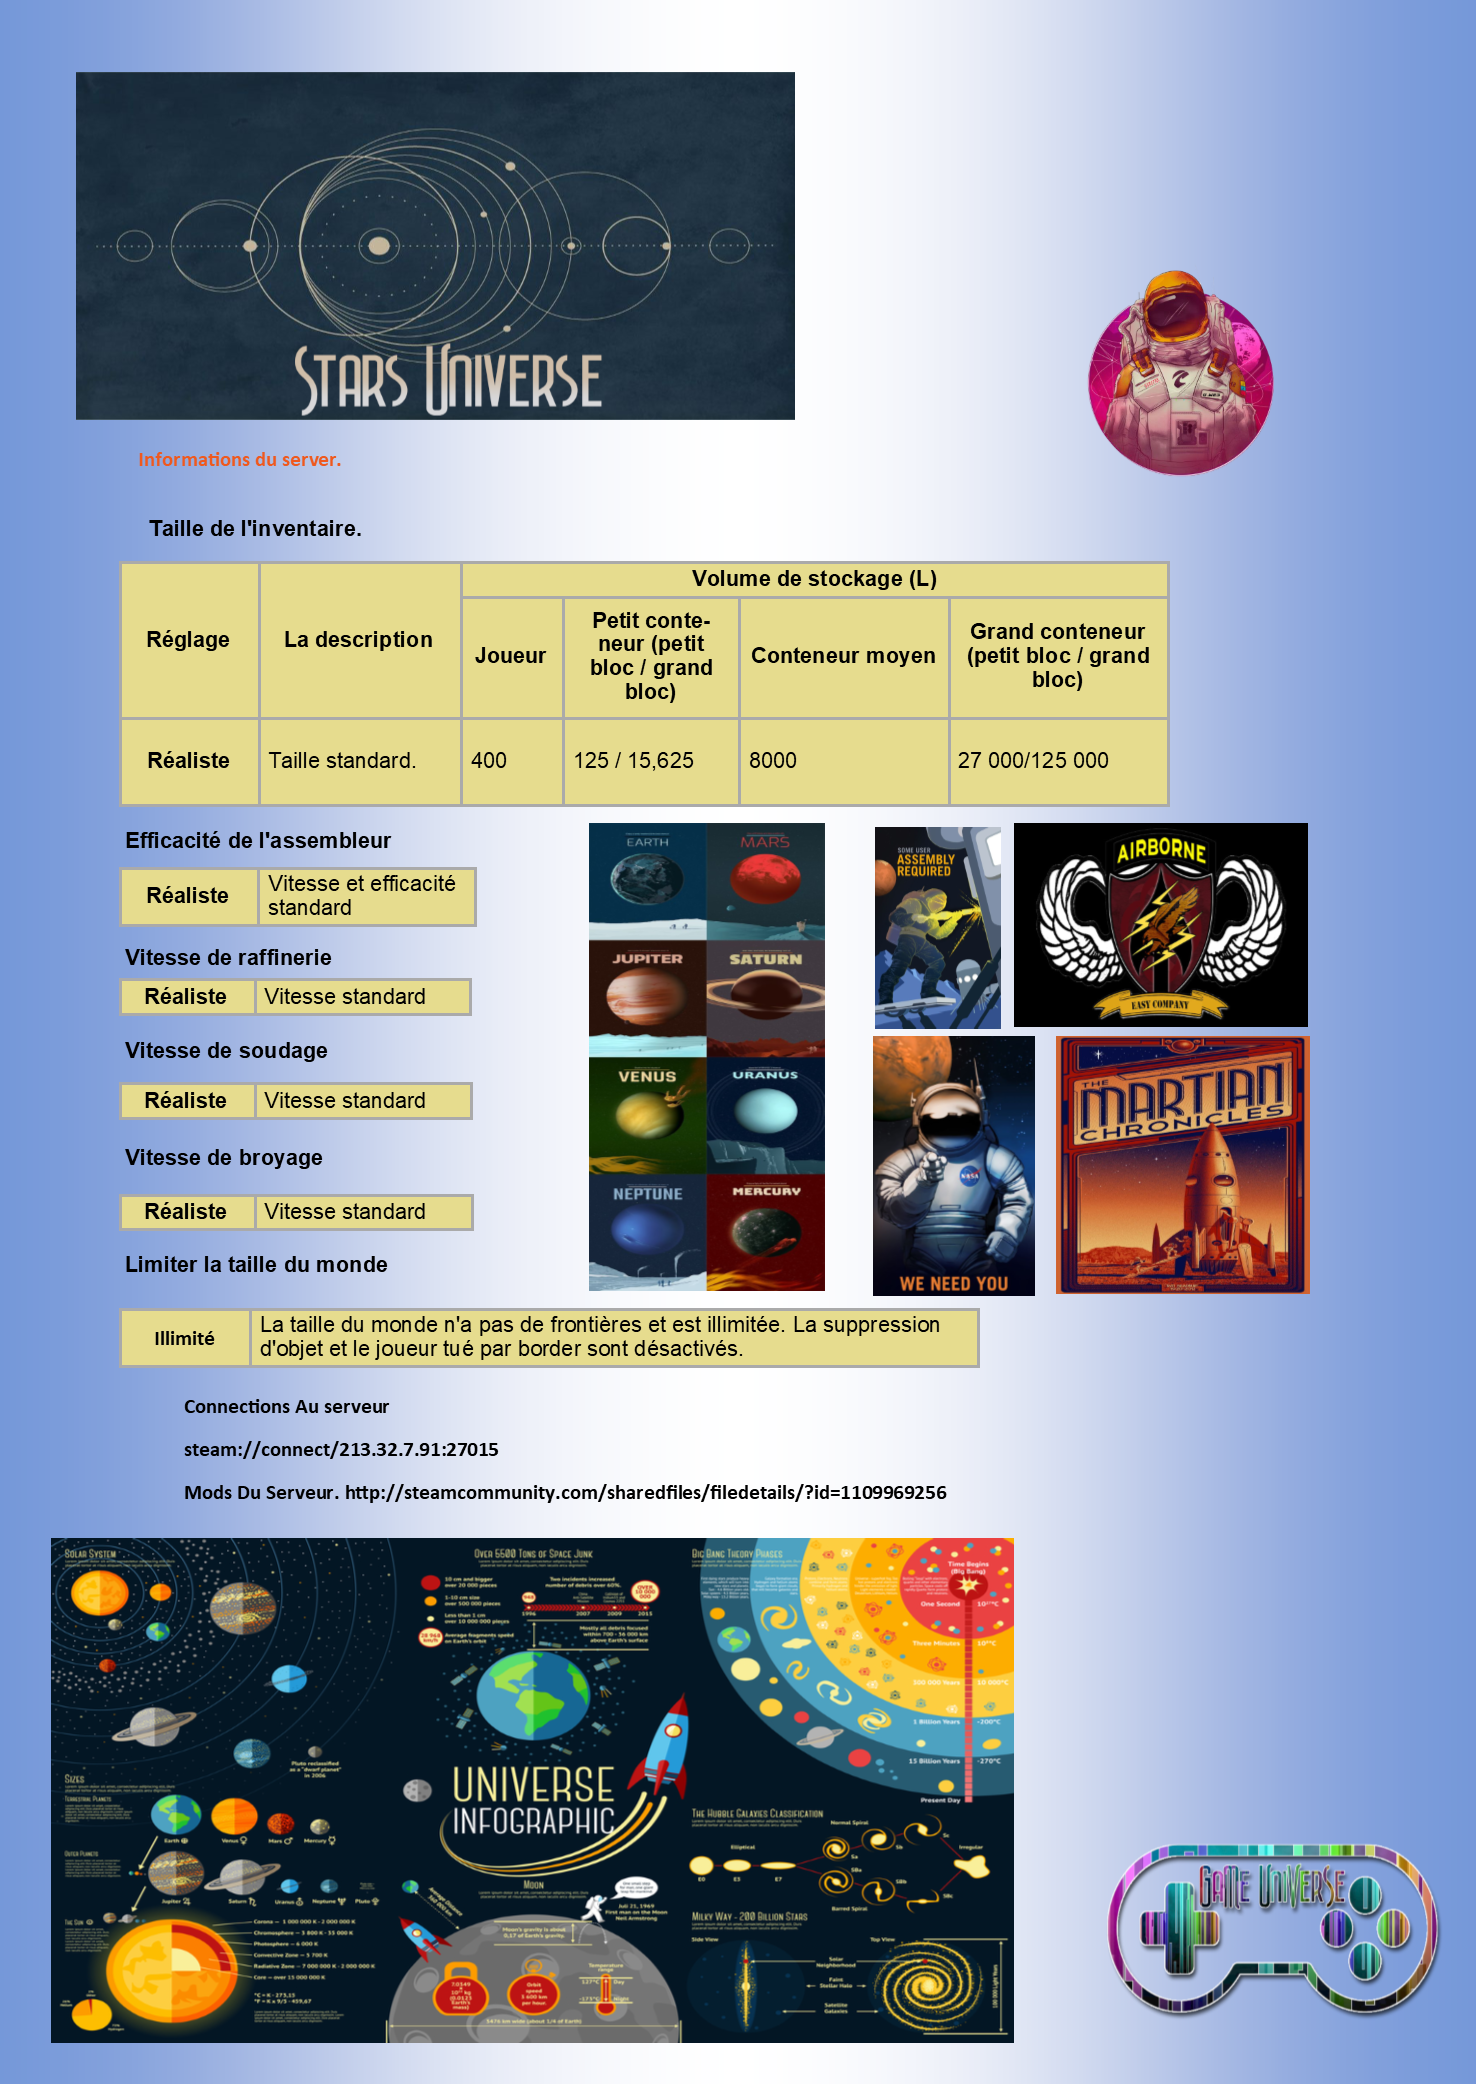 5c602fc6cd5b4-Stars Universe.png